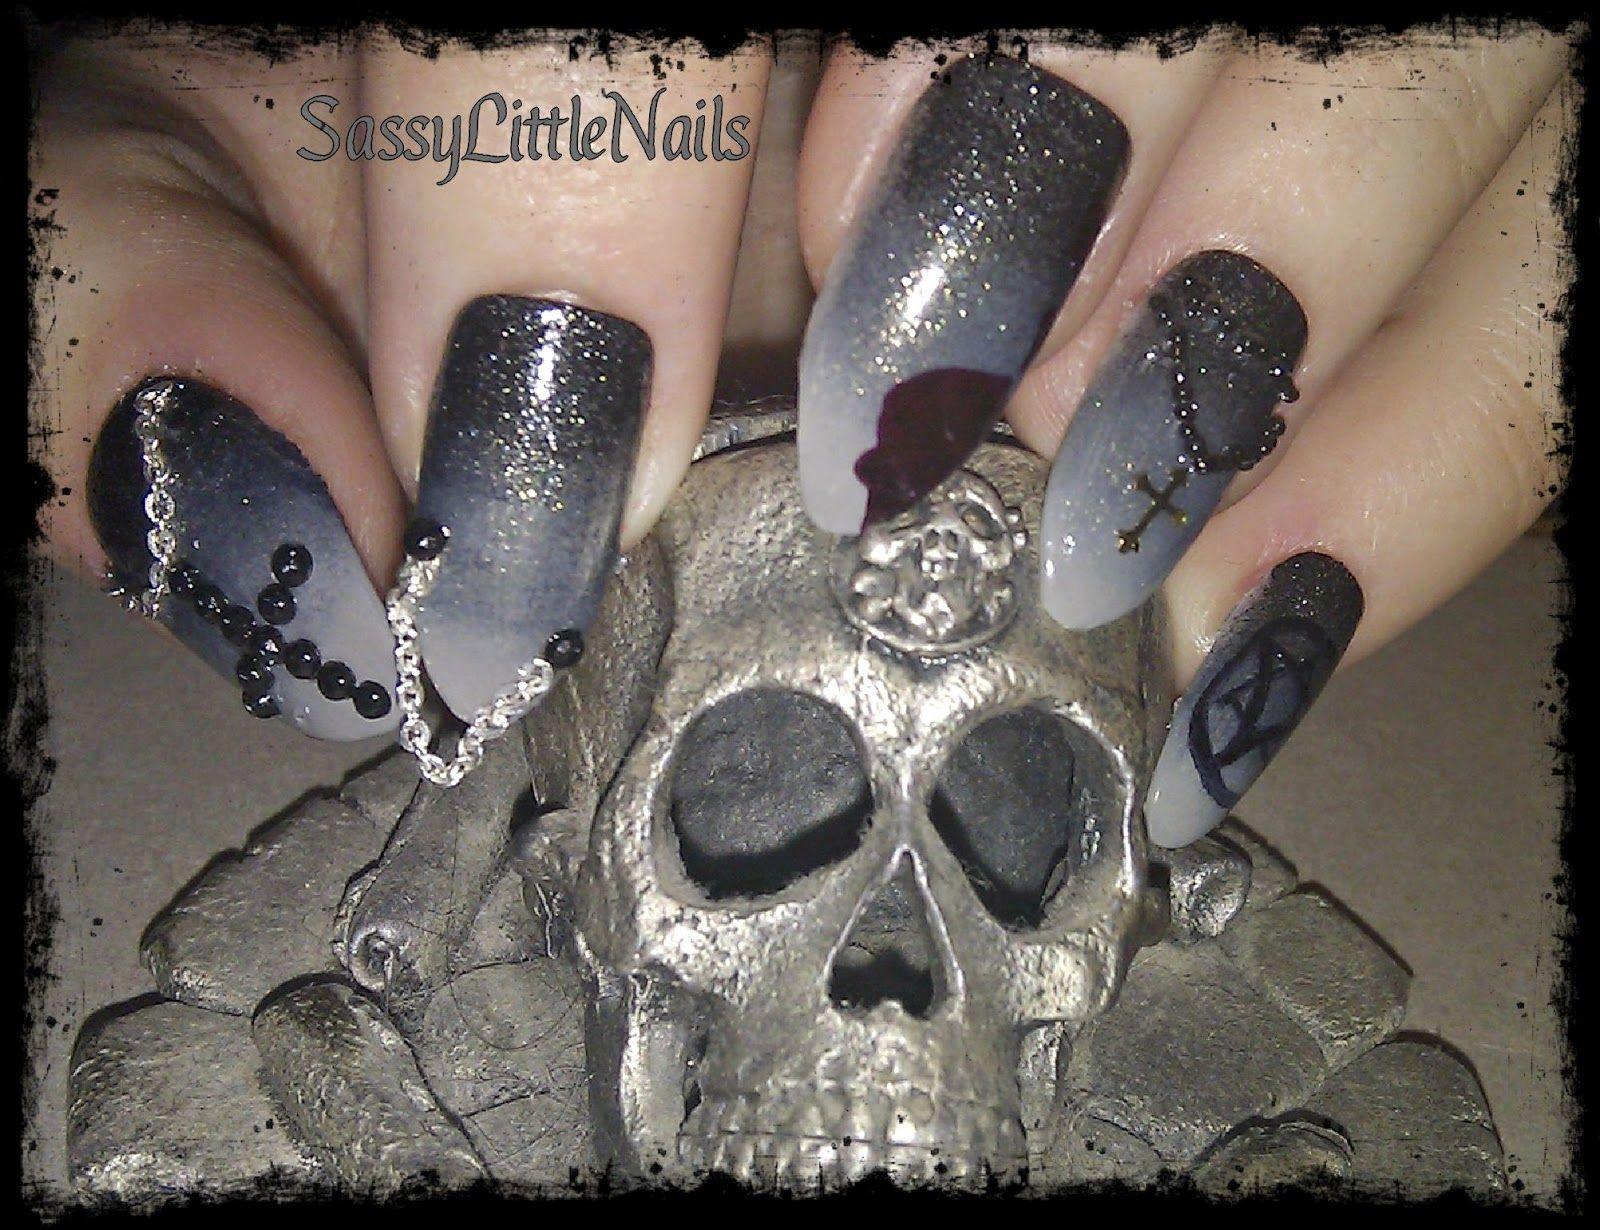 Pin de Lisa Lewis en 3D nail art | Pinterest | Mariposas